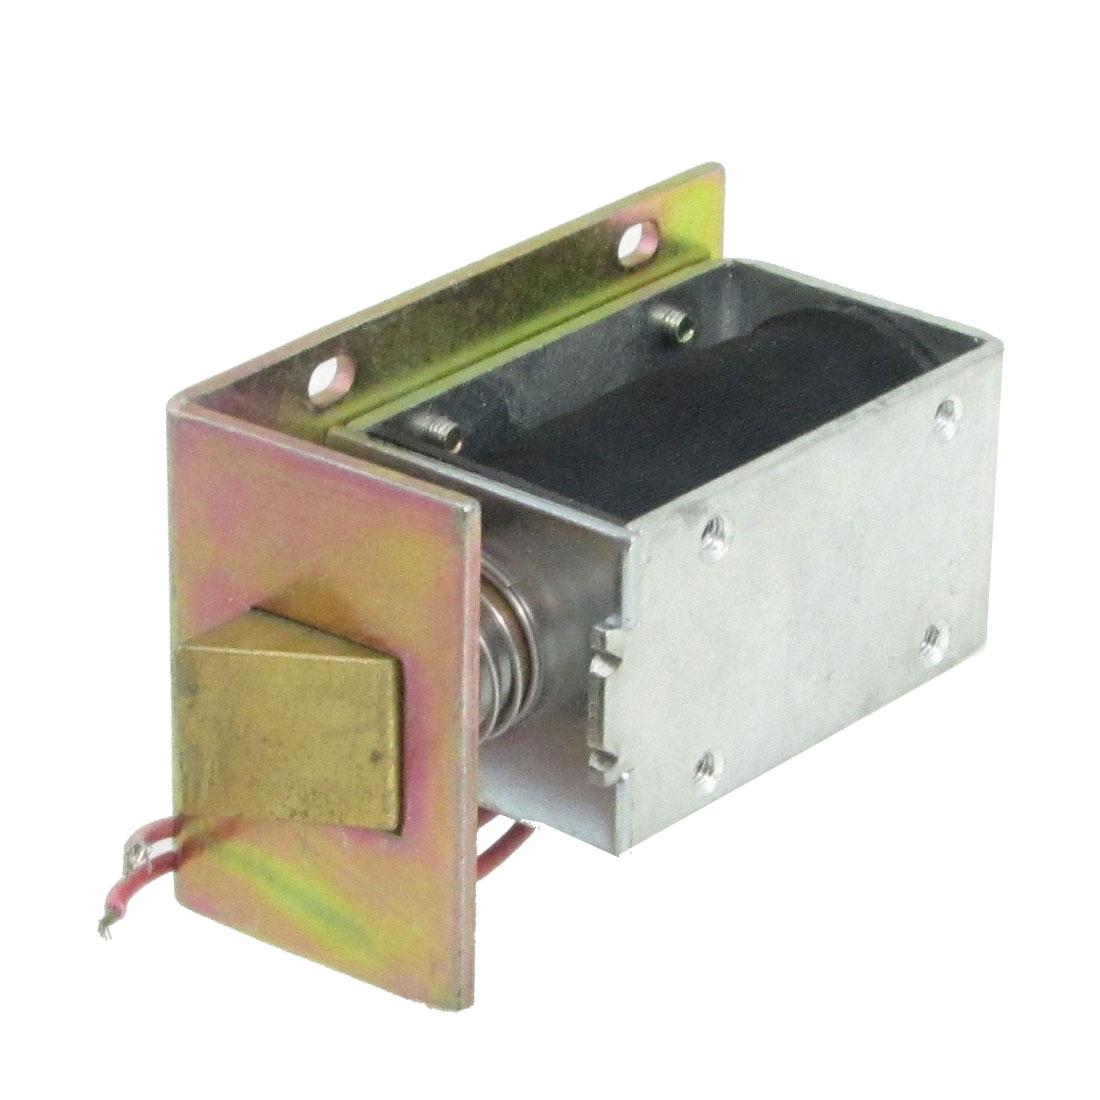 DC 12V 0.83A 5mm 0.6Kg Open Frame Type Solenoid for Electric Door Lock